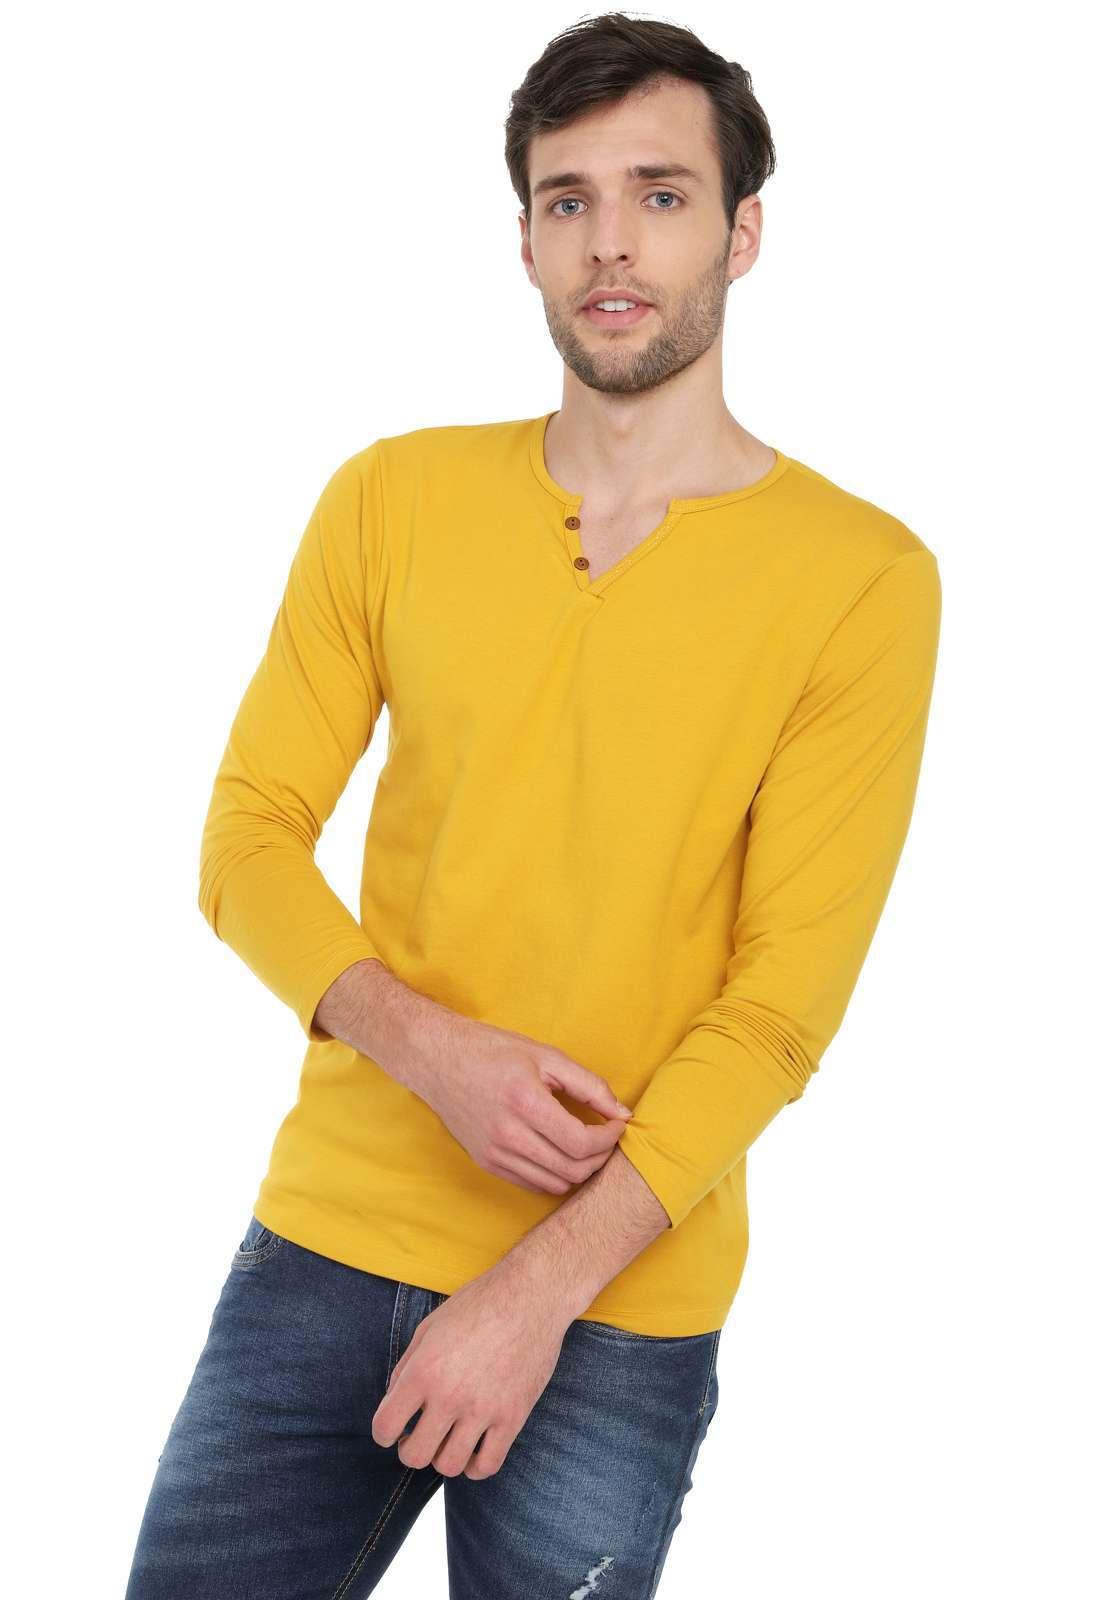 Camiseta Manga Larga Licrada - Mostaza | Polovers